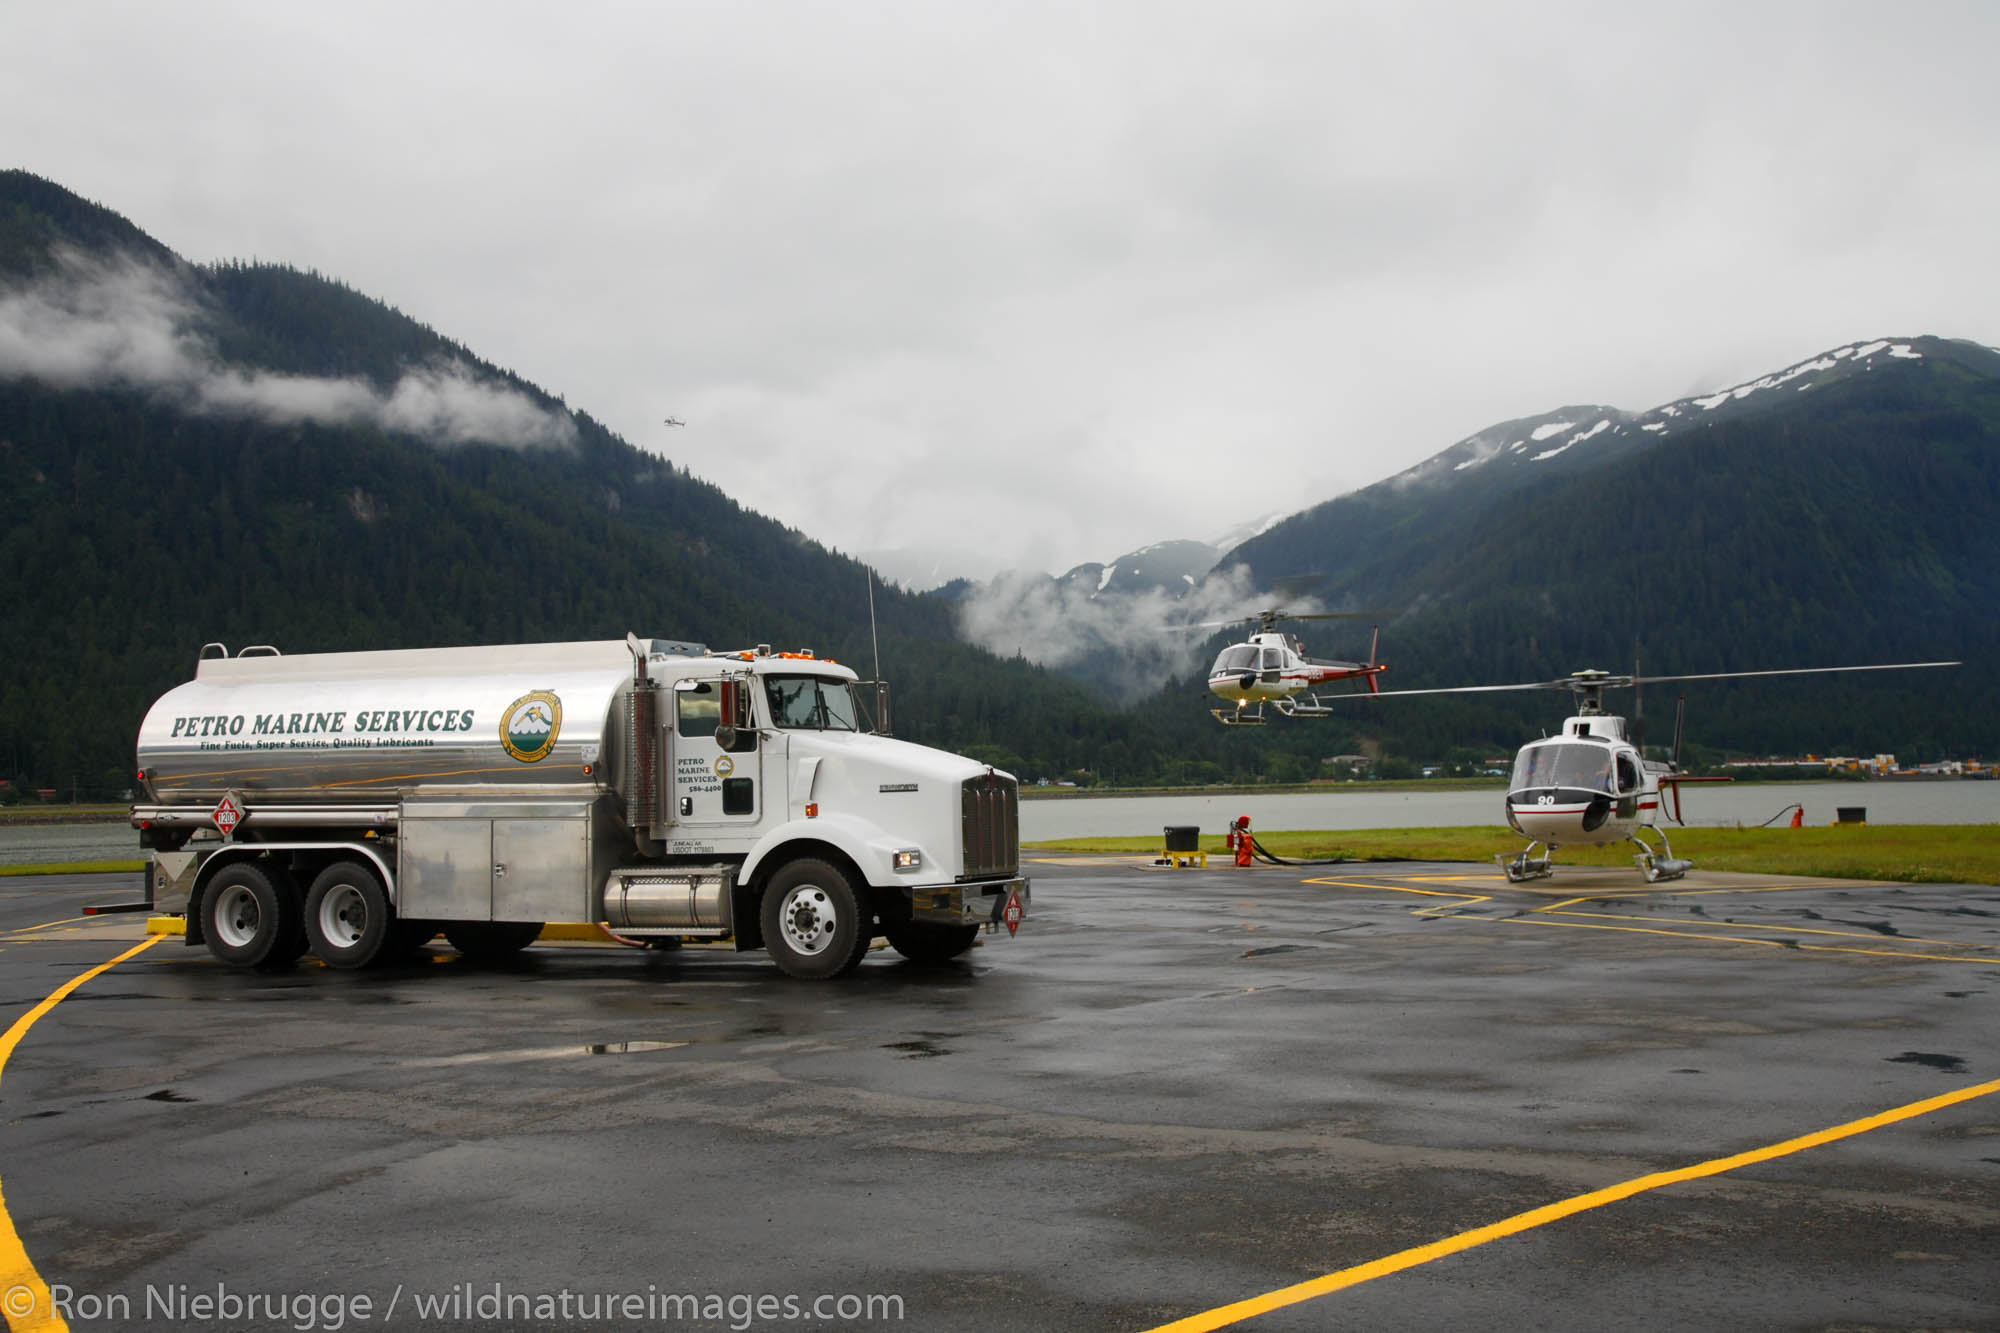 Petro Marine Services truck delivering fuel to ERA, Juneau, Alaska.